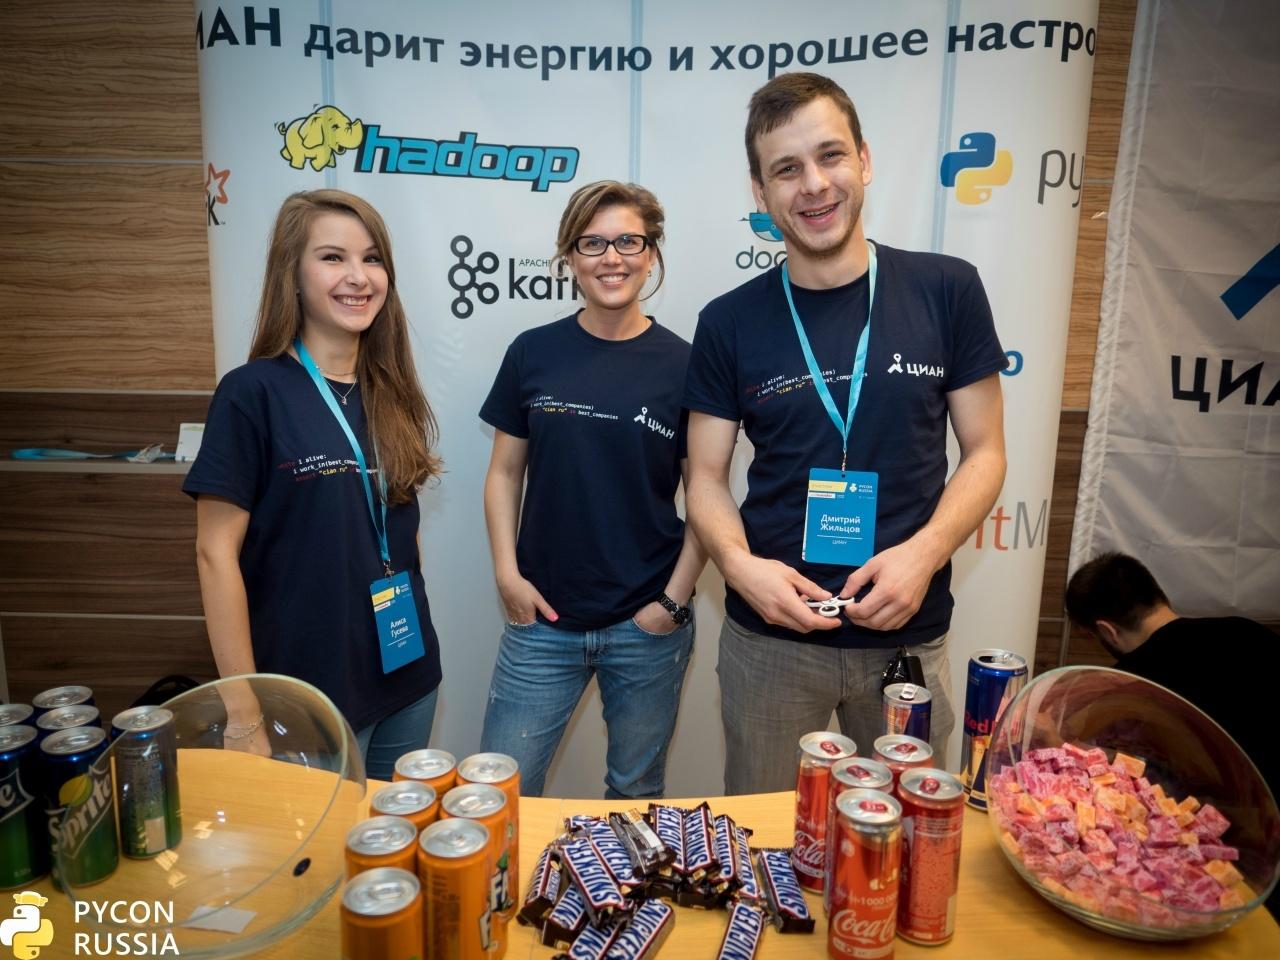 PYCON RUSSIA 2017: видео всех докладов и презентации - 3